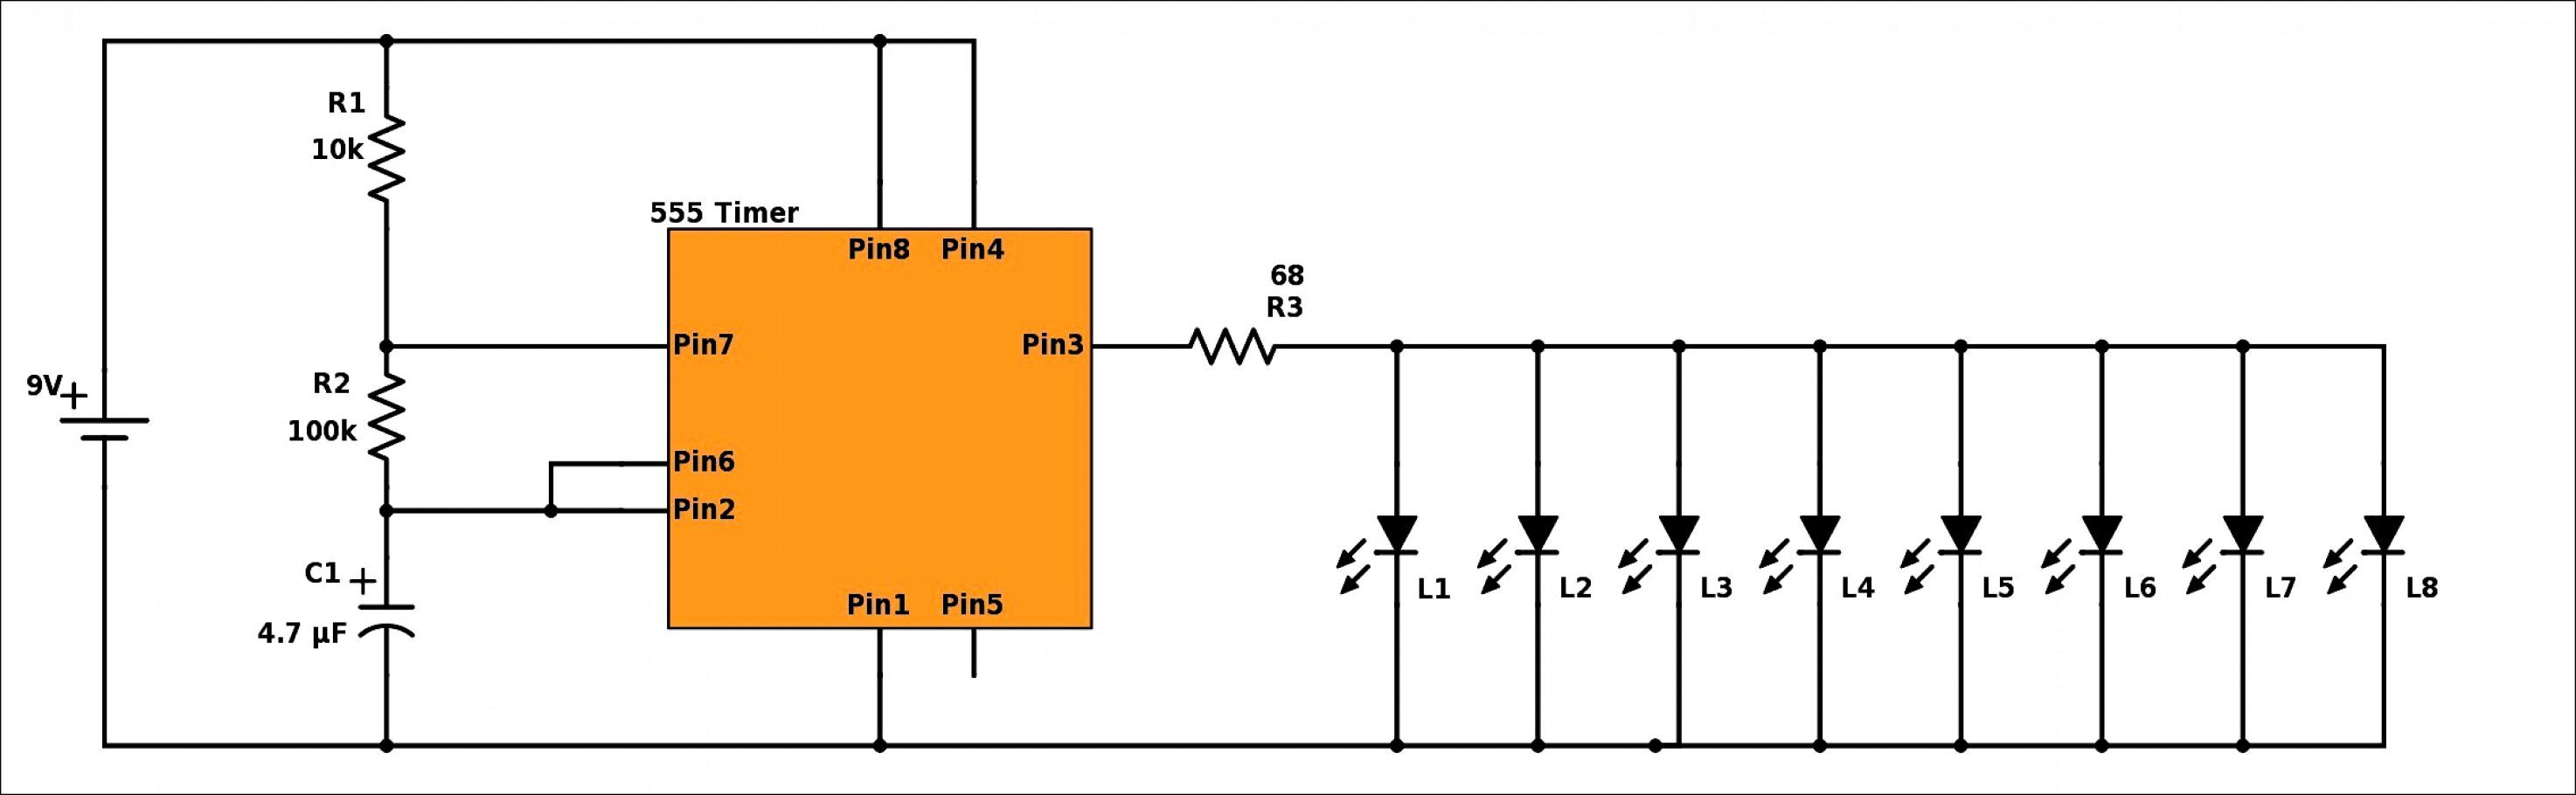 Basic Wiring Diagram For Christmas Lights | Manual Books - Christmas Light Wiring Diagram 3 Wire